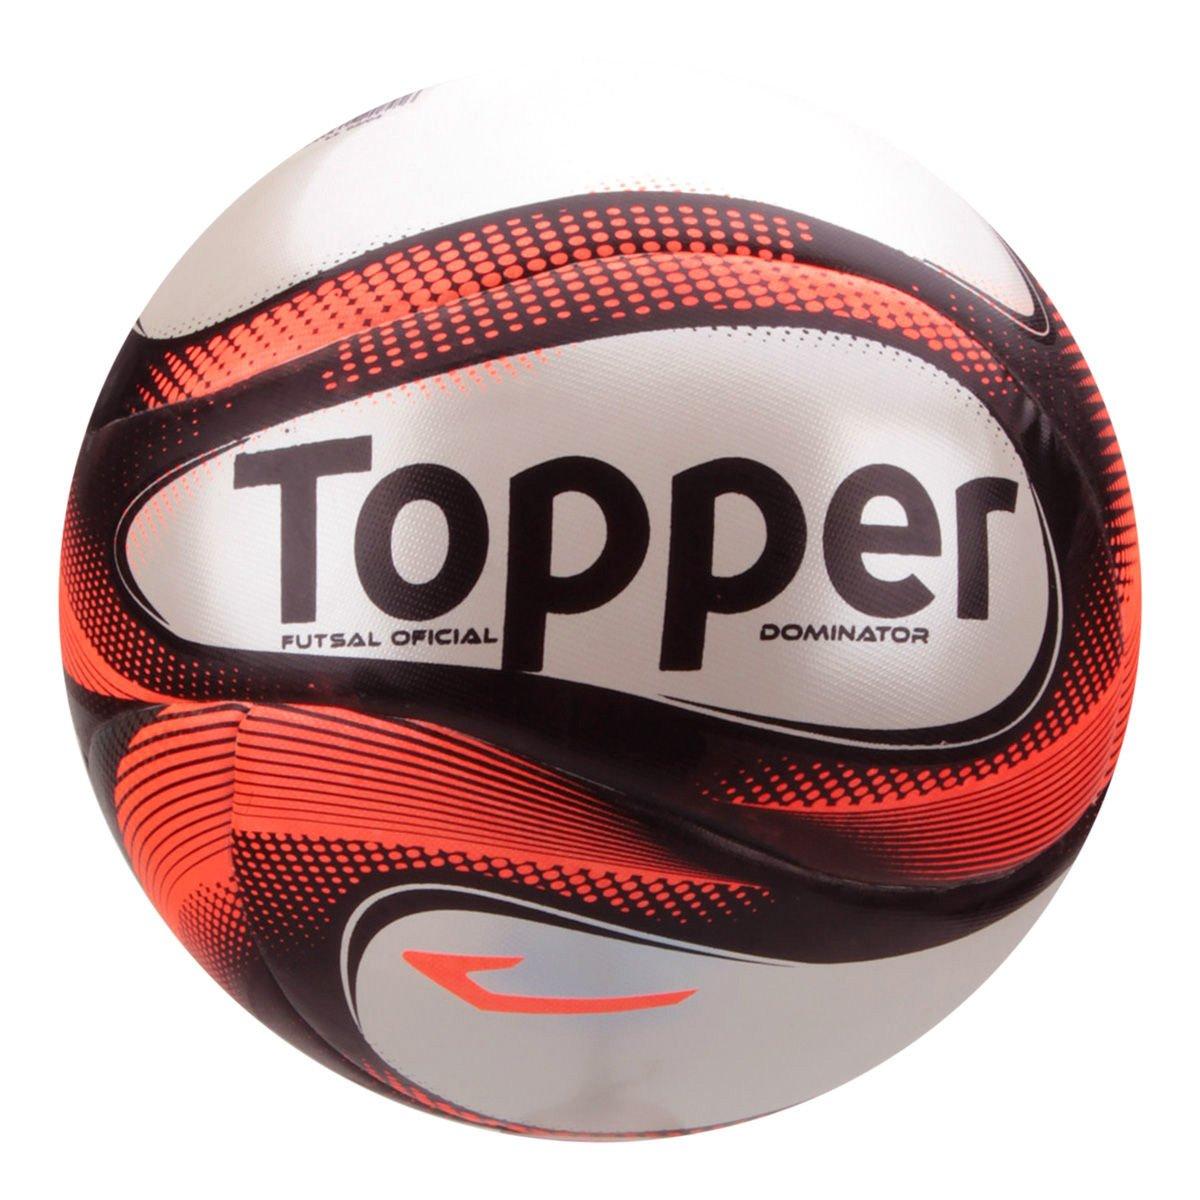 Bola Futsal Topper Dominator TD1 4200711 0014 - Coral Neo - Botas ... 21a162b600827